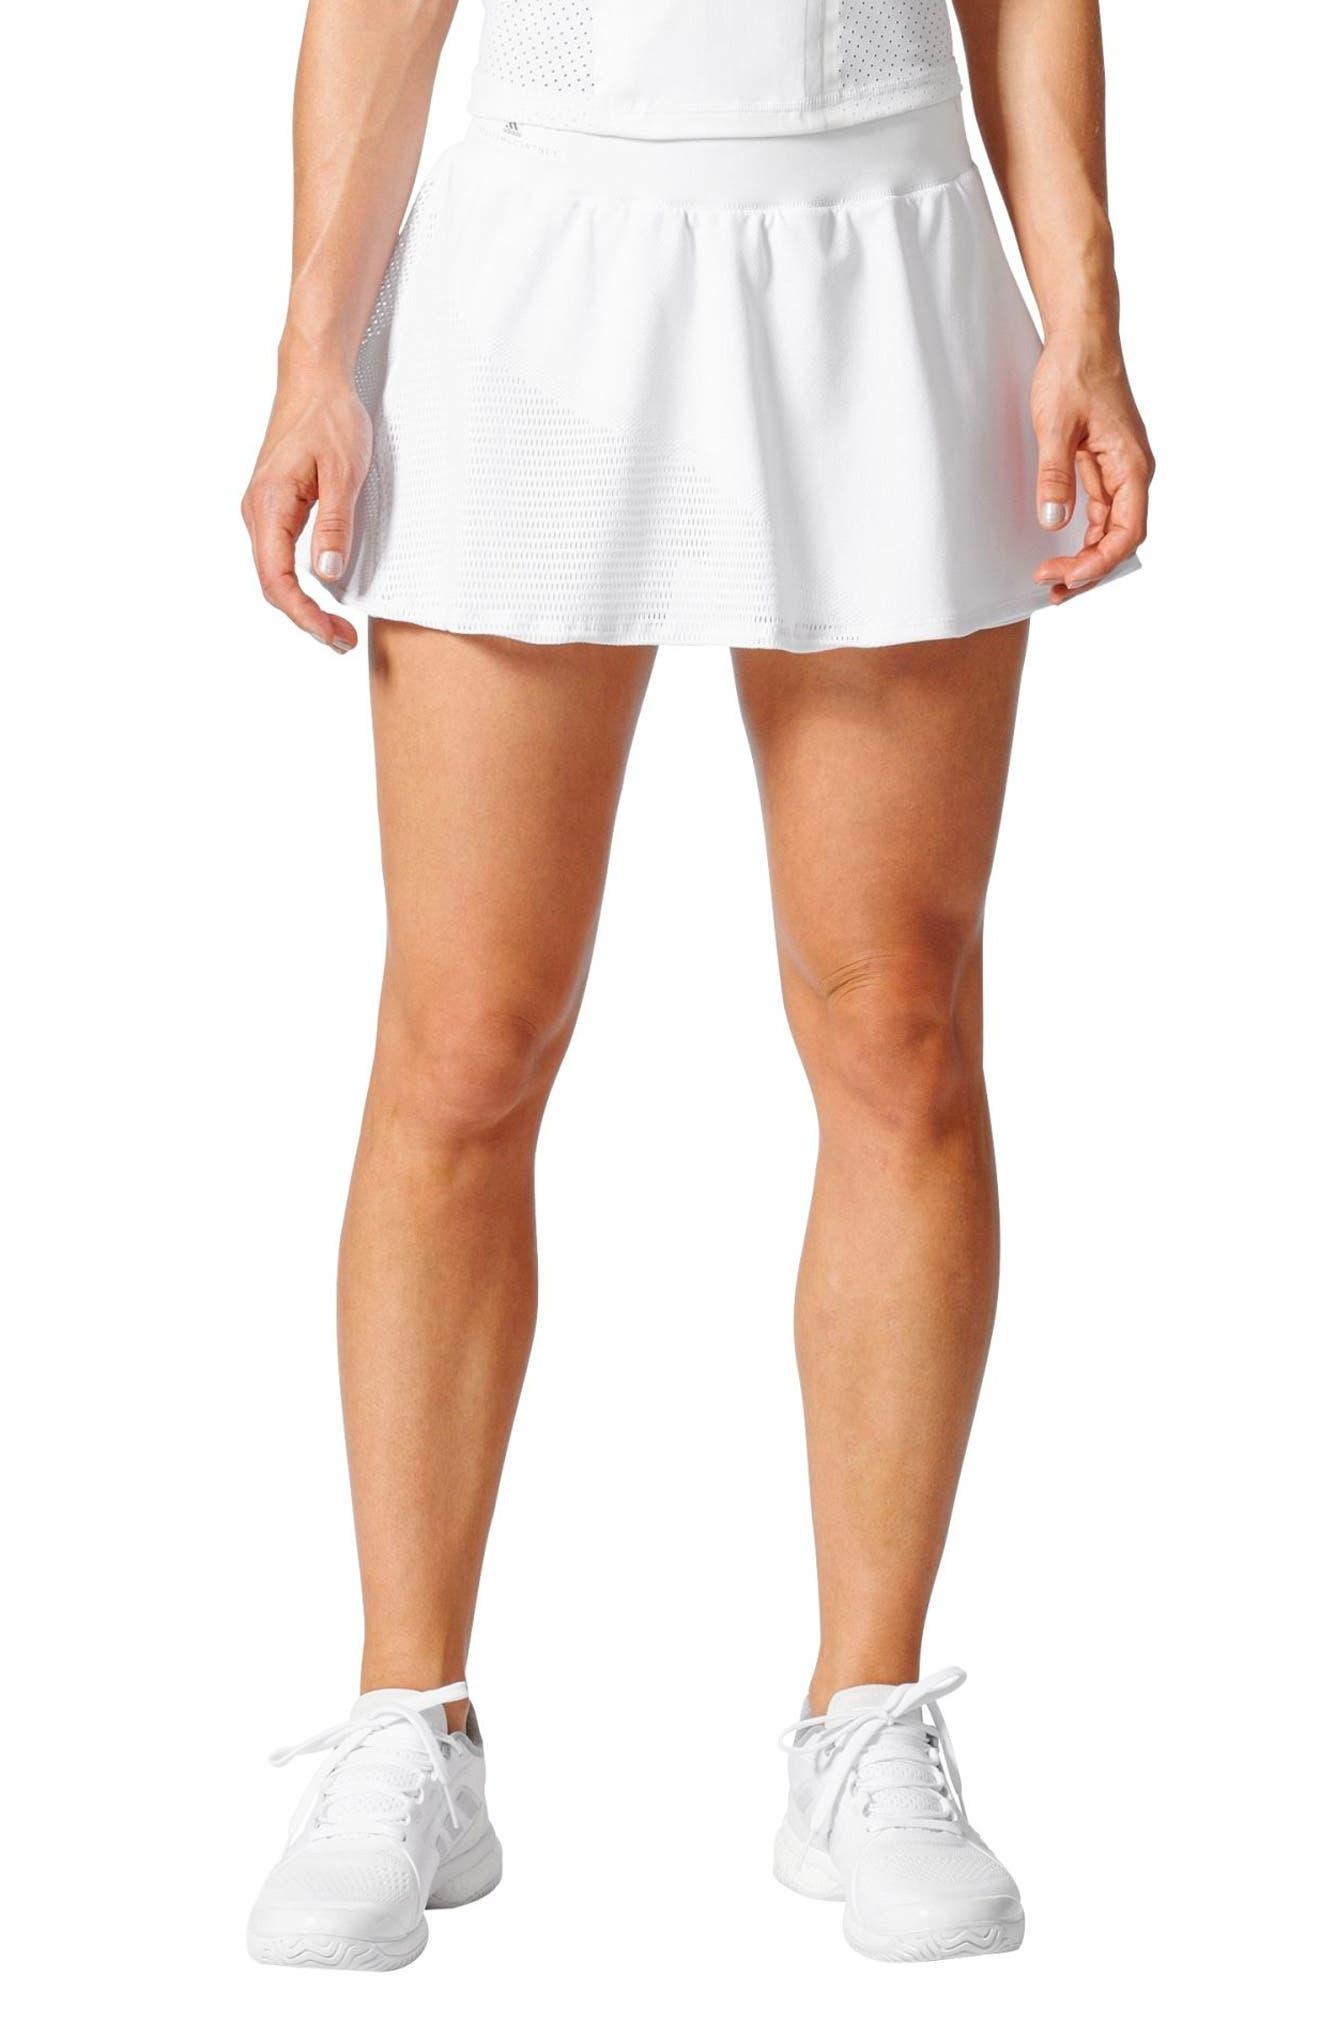 Main Image - adidas by Stella McCartney Barricade Climacool® Tennis Skirt